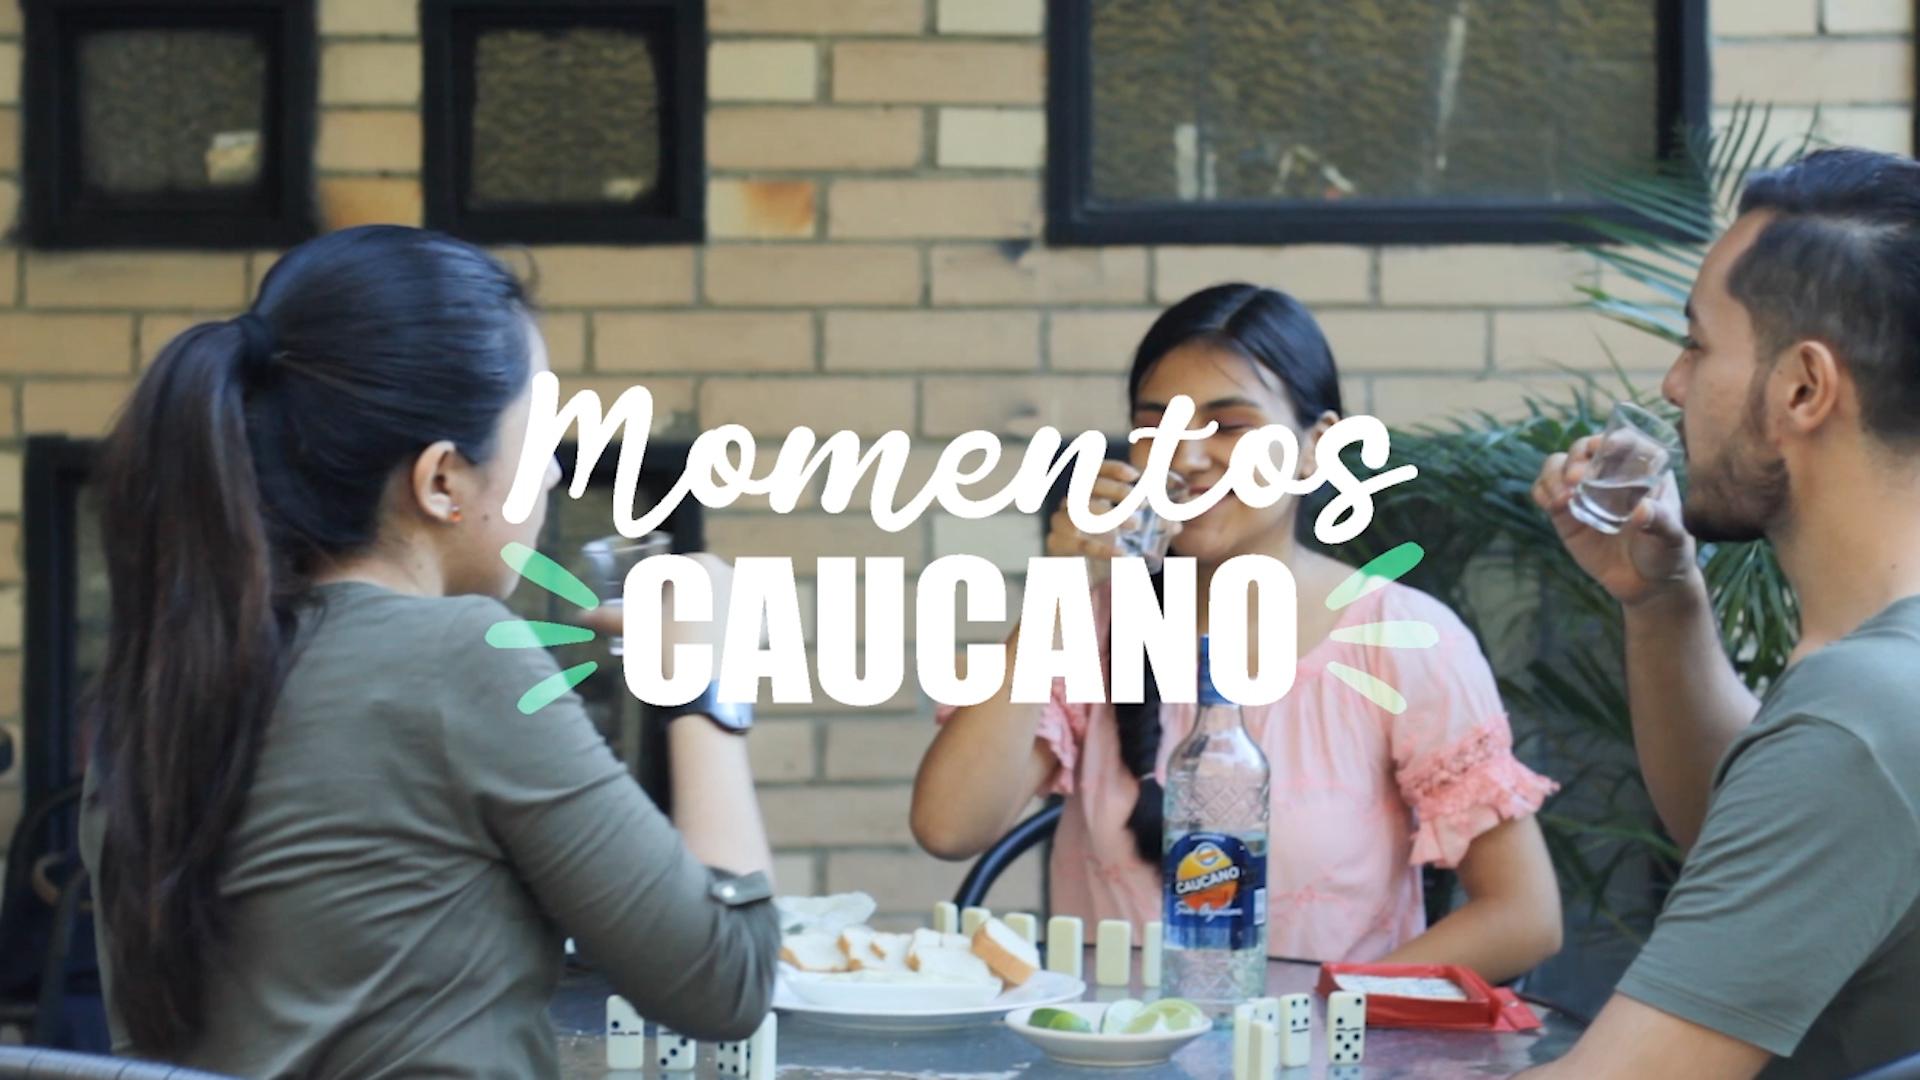 #MomentosCaucano